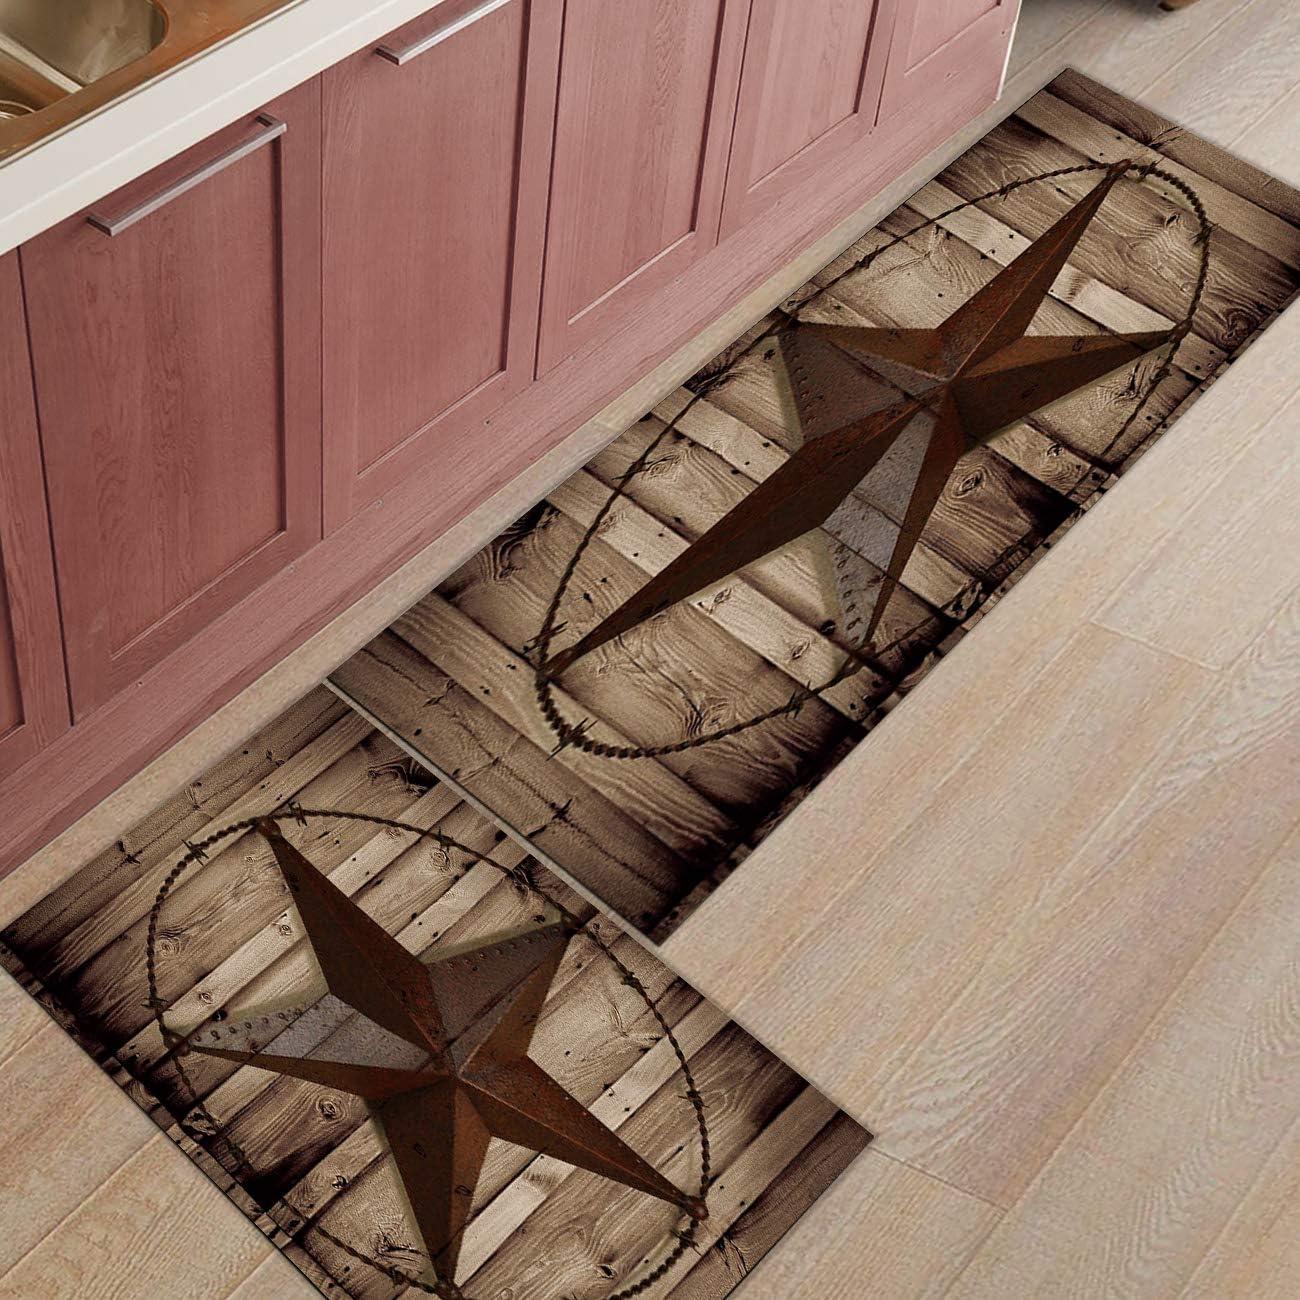 Shine-Home Regular discount 2 Piece Non-Slip Kitchen Deluxe Backing Mat R Doormat Rubber